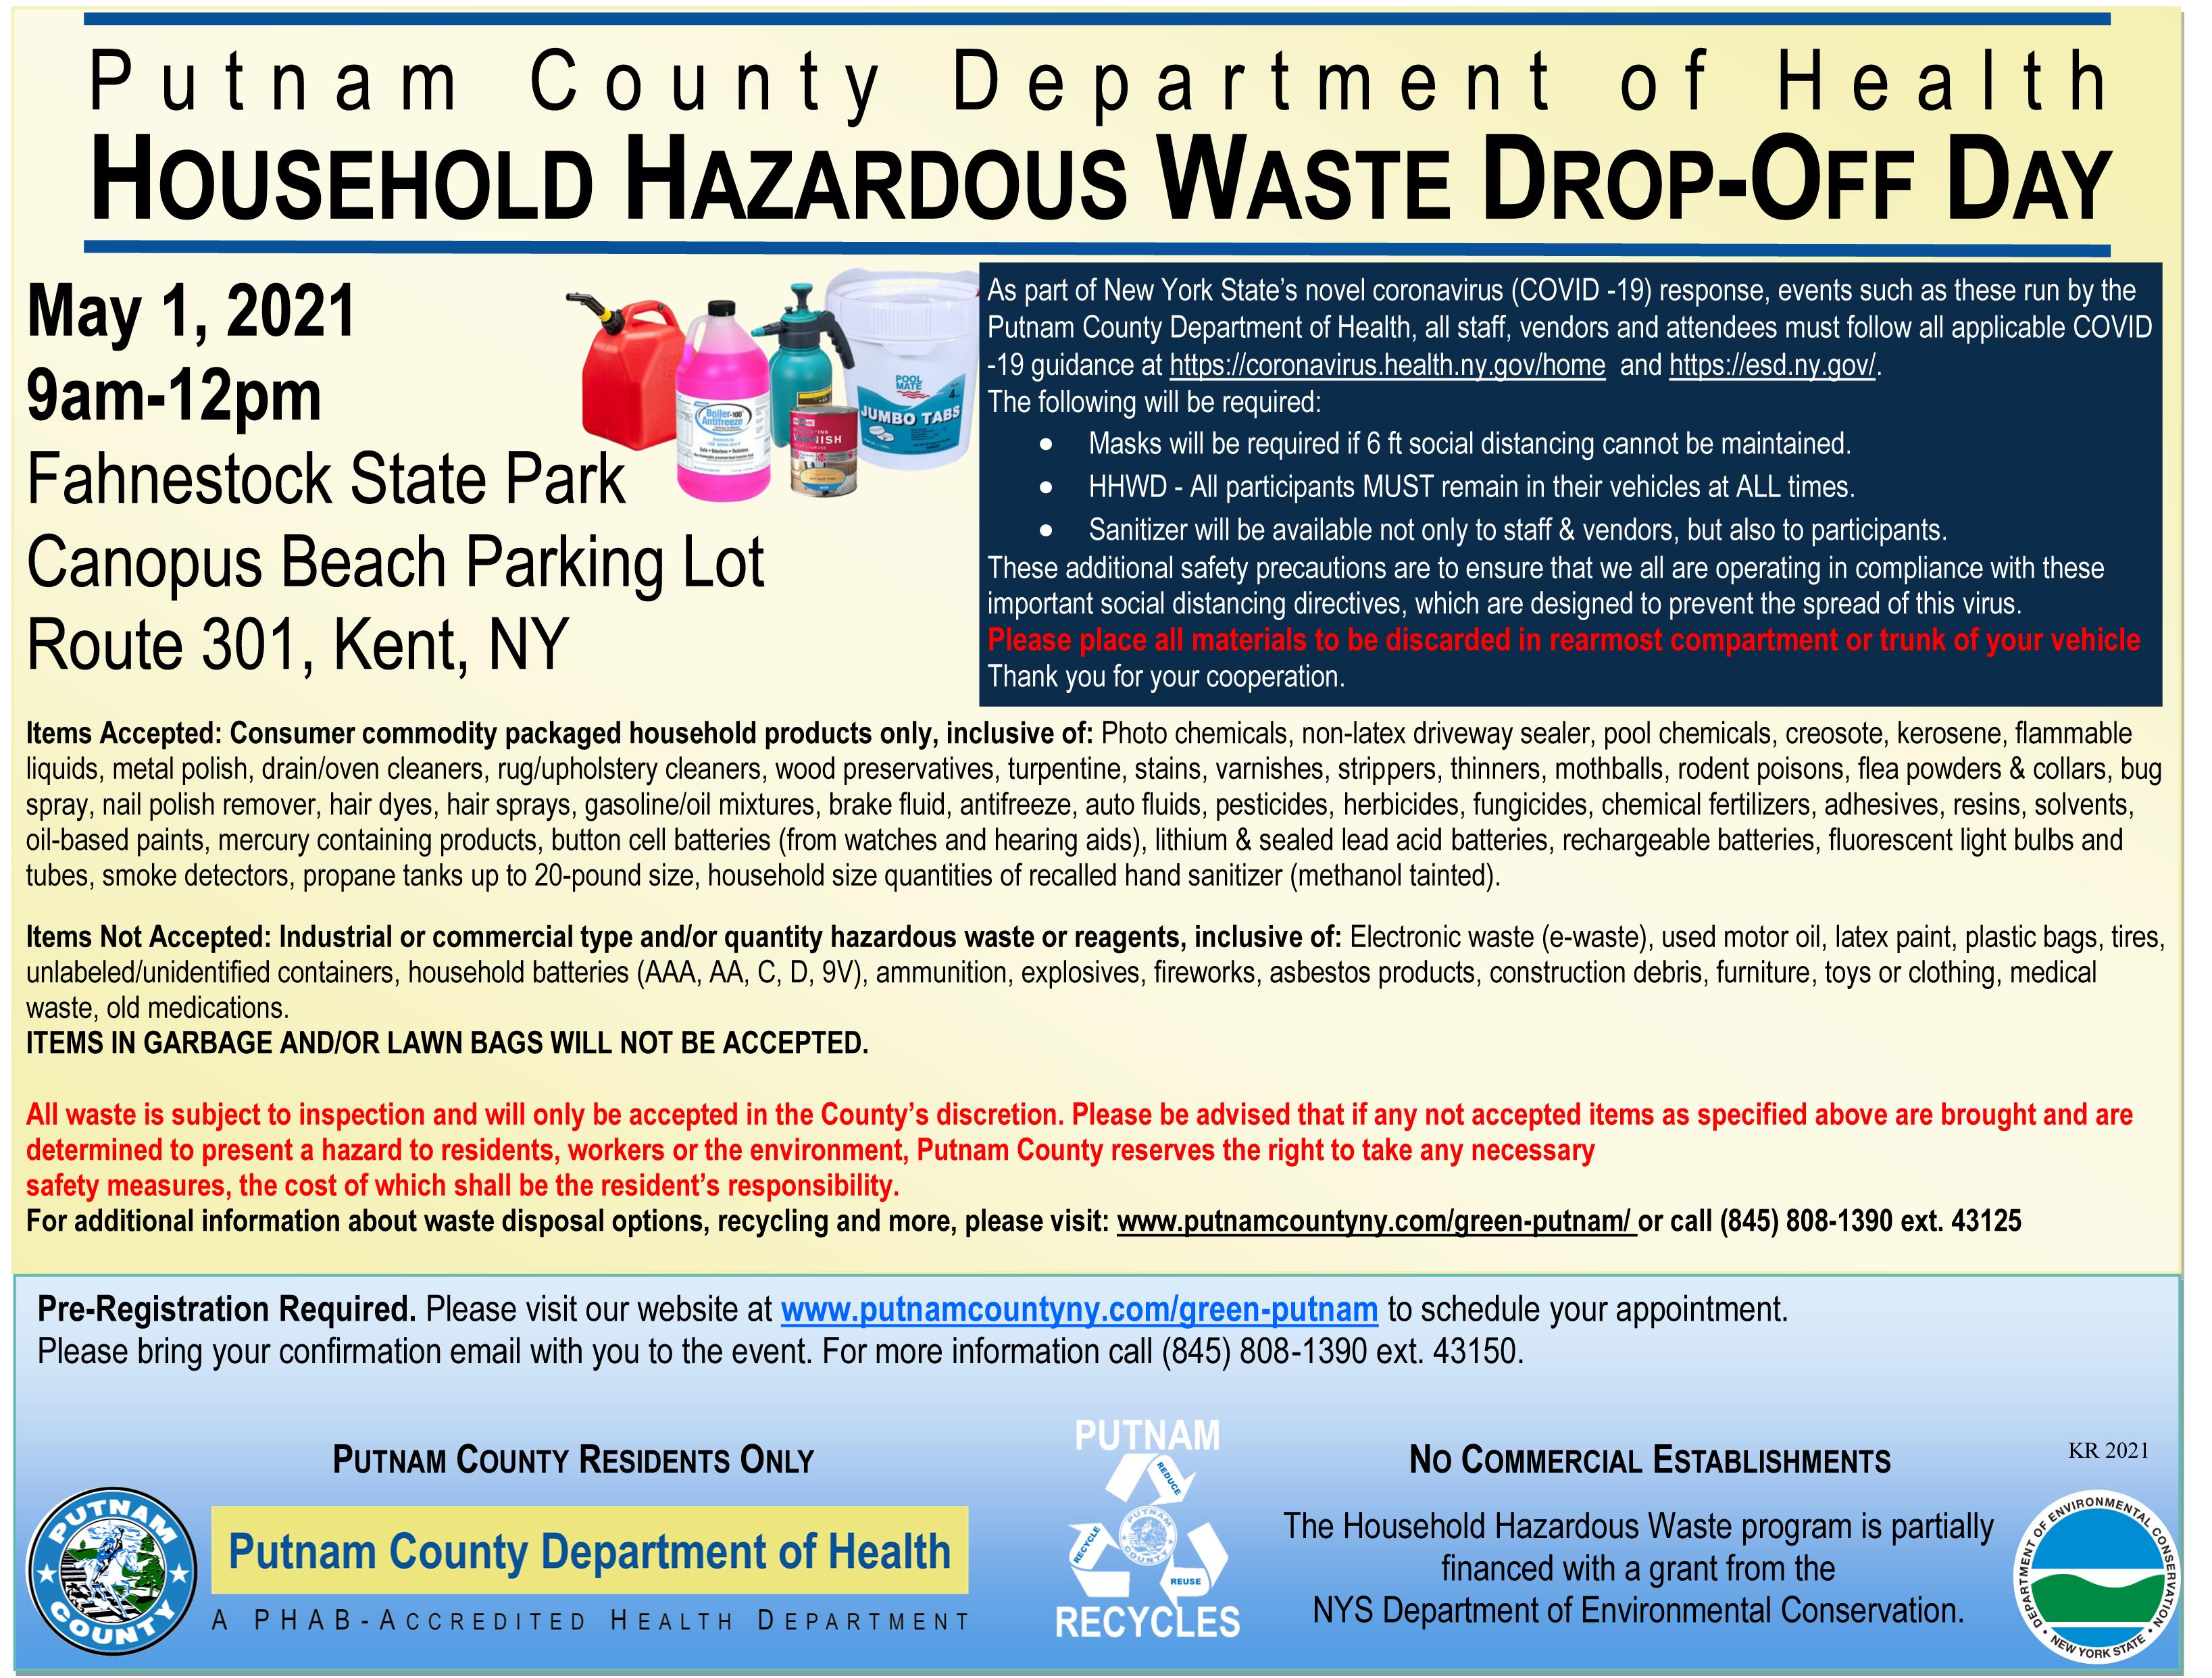 Household Hazardous Waste Drop-Off Day